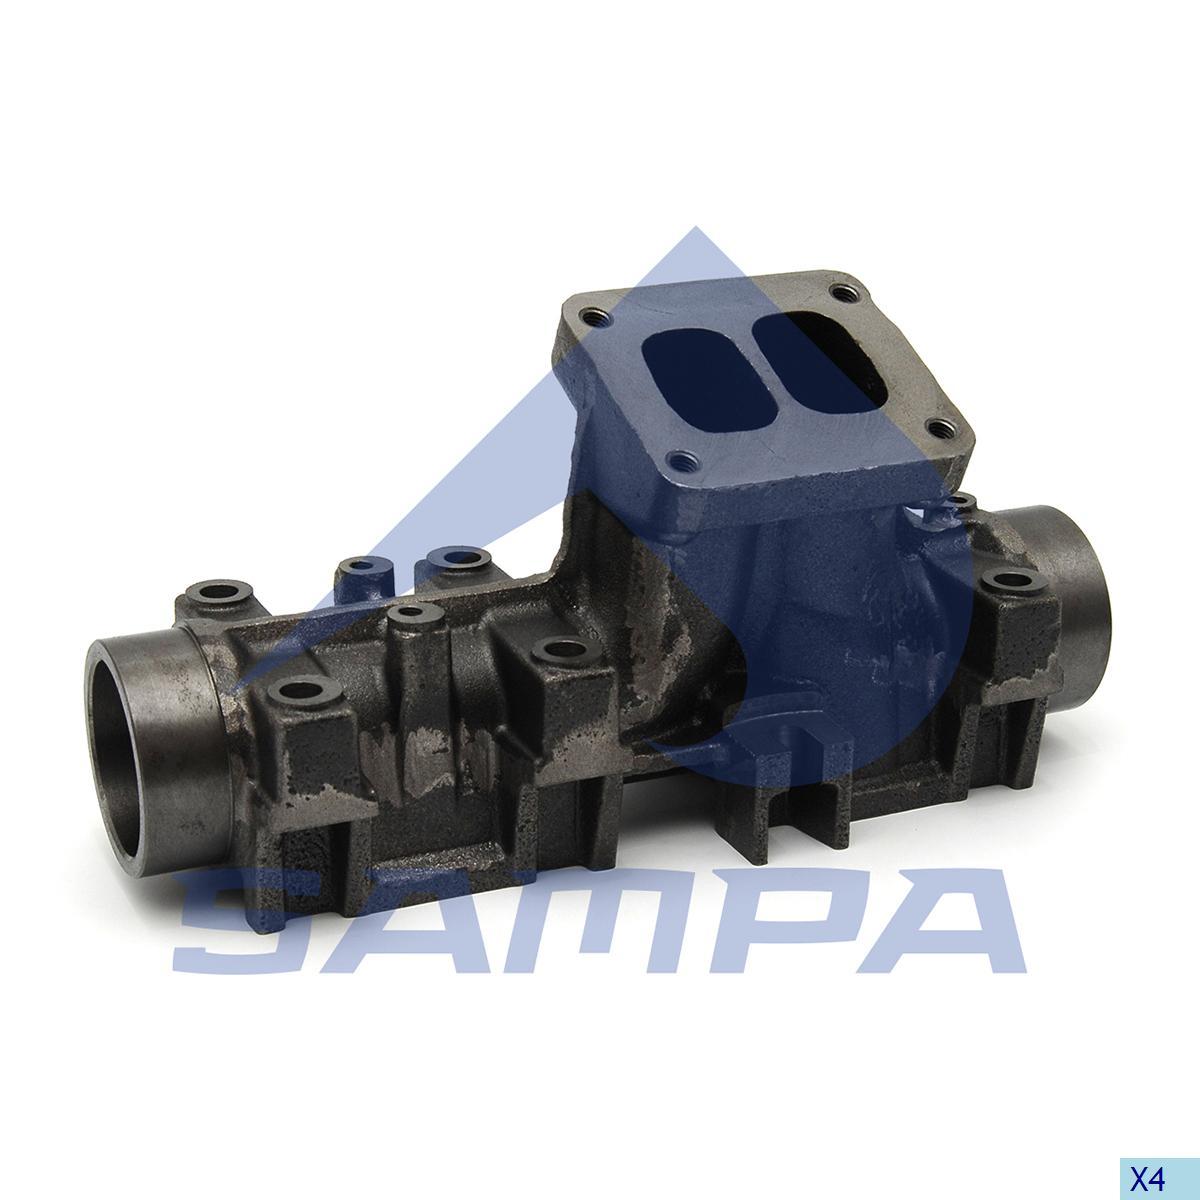 Exhaust Manifold, Man, Engine